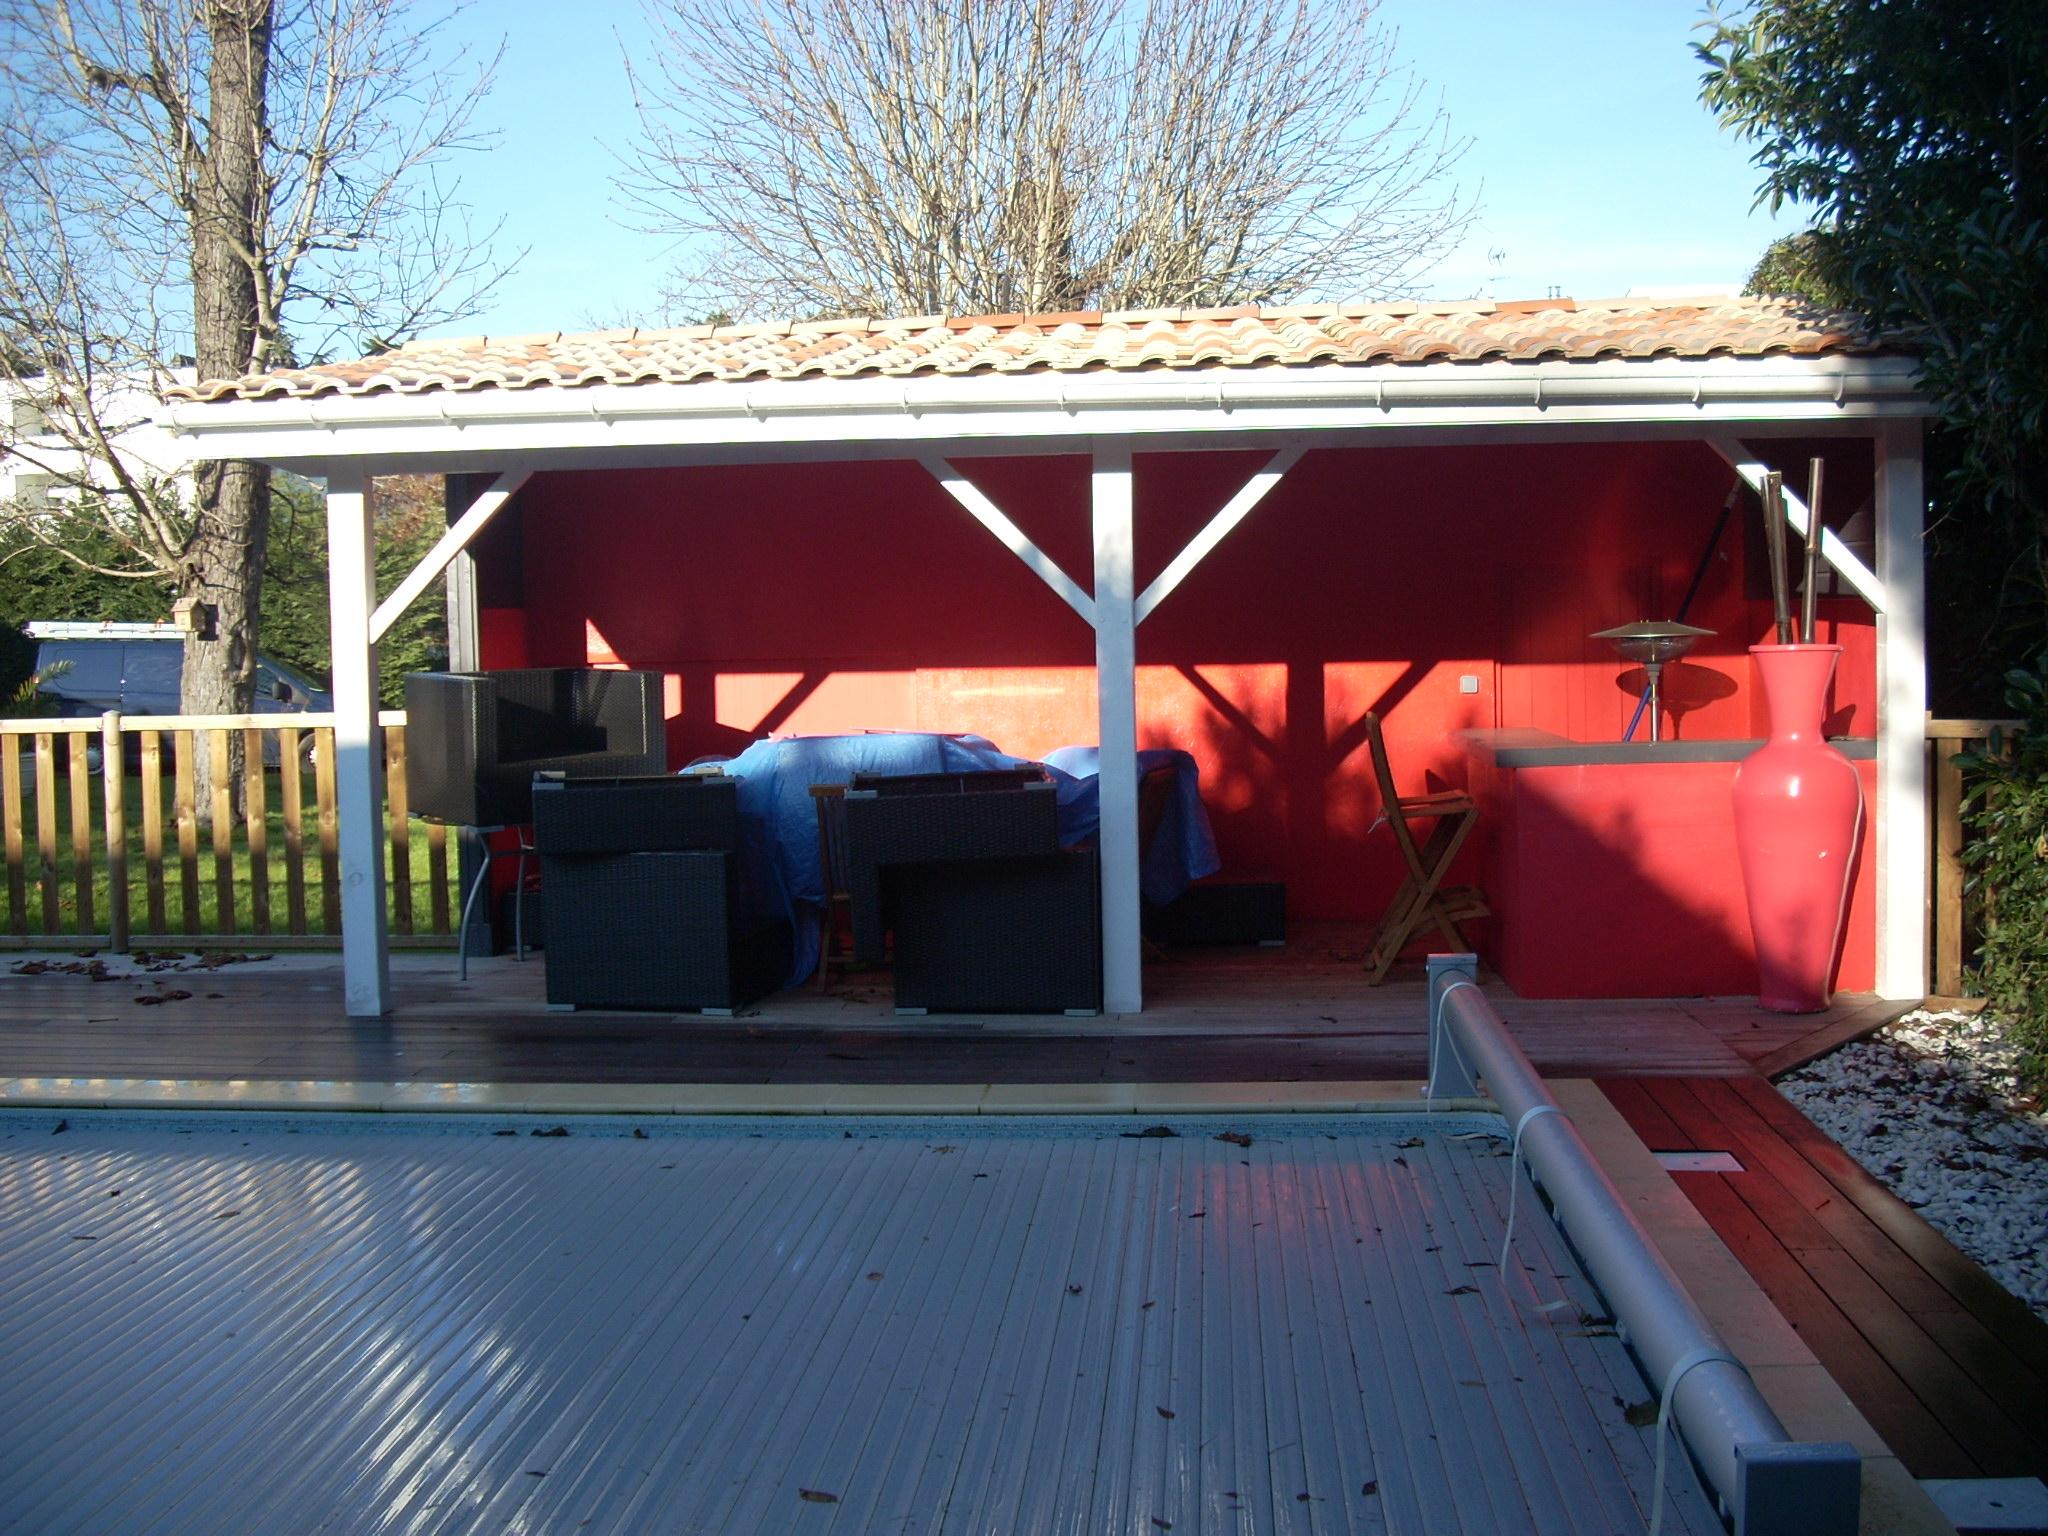 R novation de pool house lacanau charpente traditionelle terrasse ip artisan charpente menuiserie for Avancee terrasse couverte